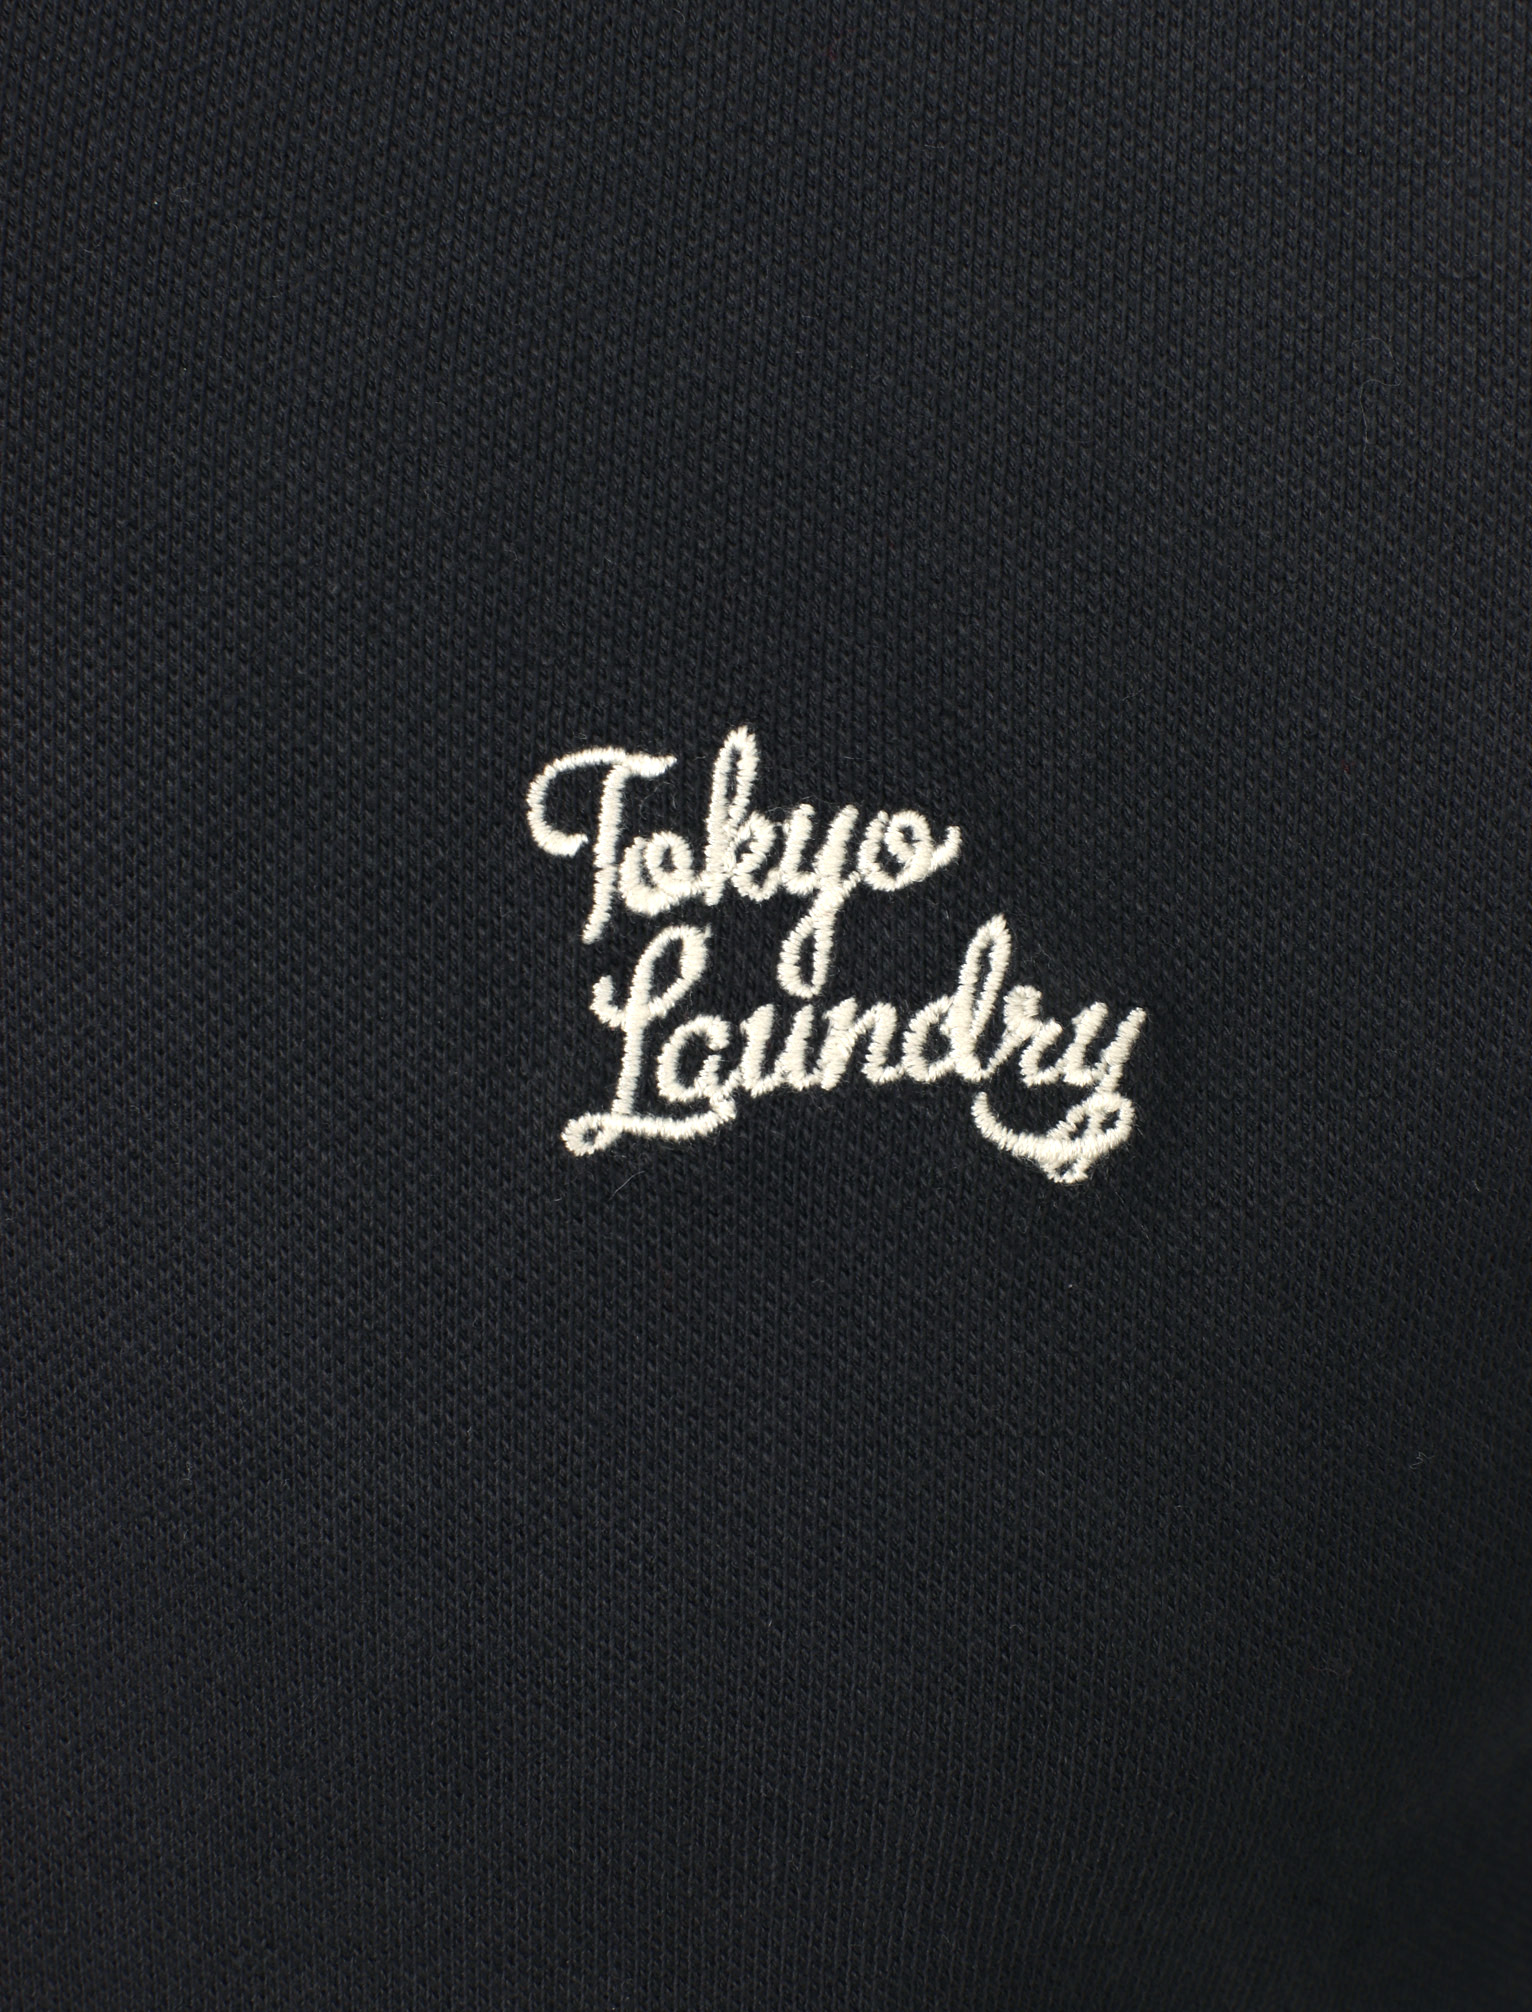 New-Mens-Tokyo-Laundry-Branded-Kuusamo-Cotton-Rich-Pique-Polo-Shirt-Size-S-XXL thumbnail 3